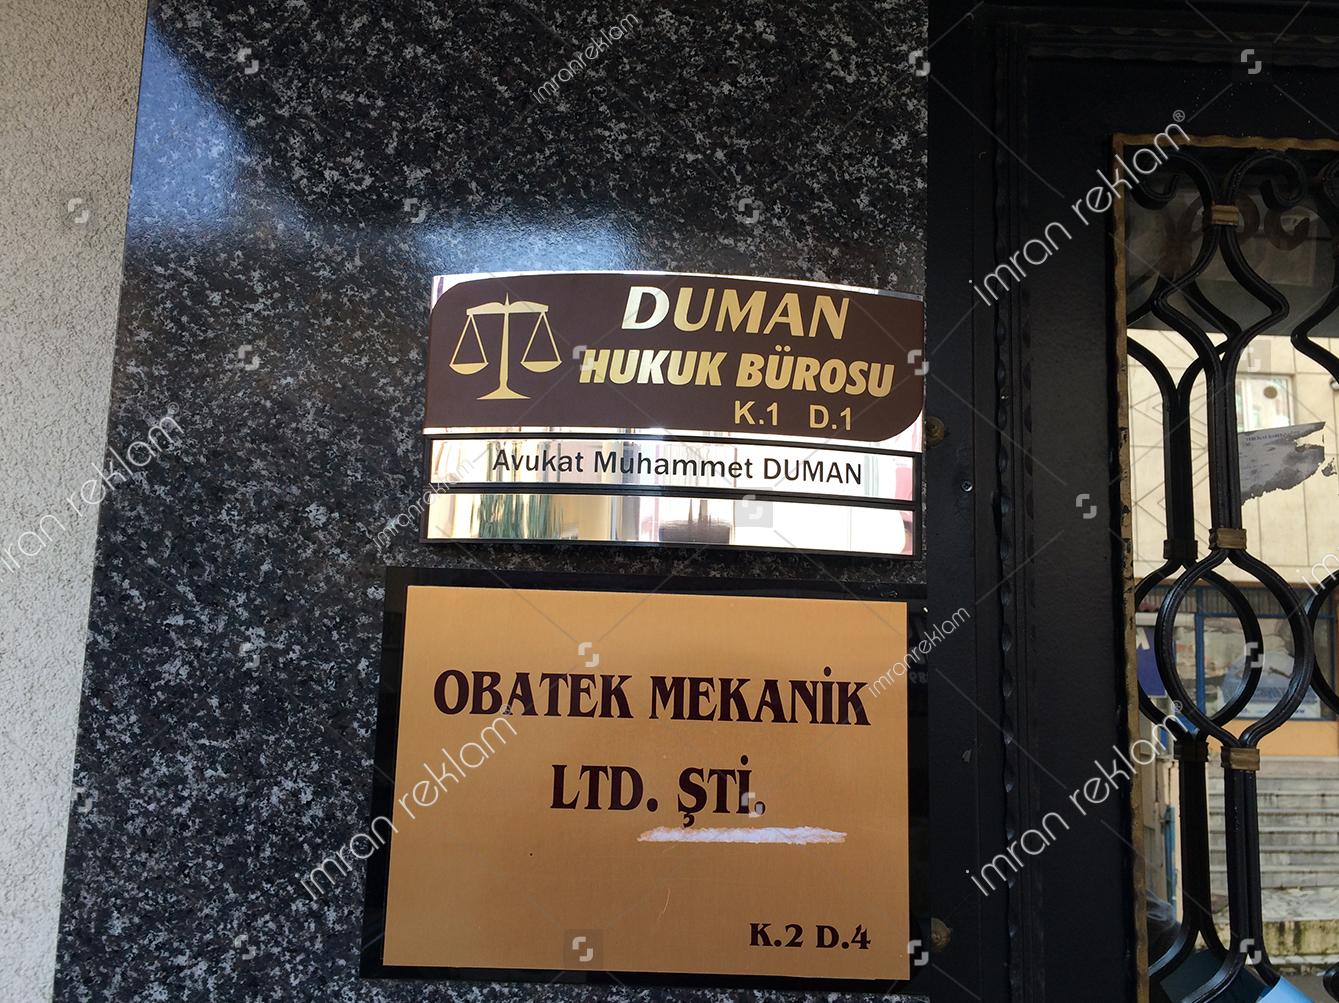 hukuk-burosu-bina-girisi-tabelasi